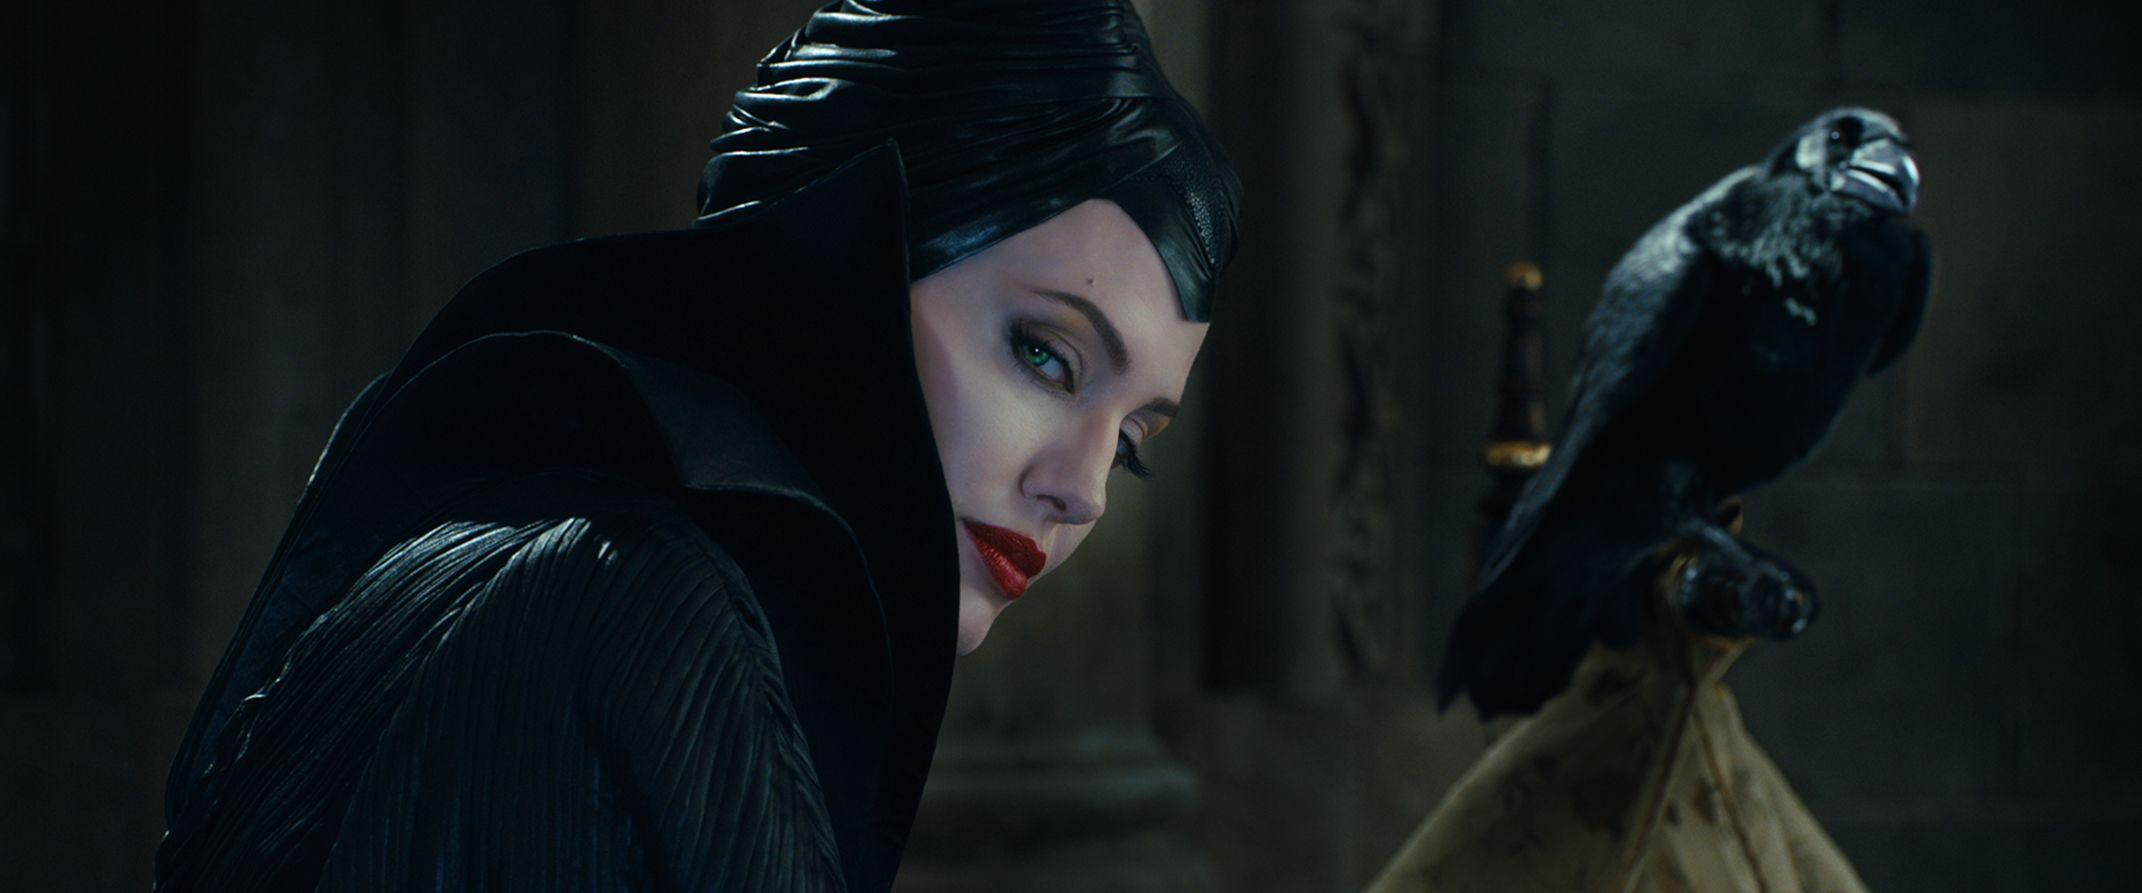 Angelina Jolie Talks MALEFICENT, UNBROKEN, Work and Family ...